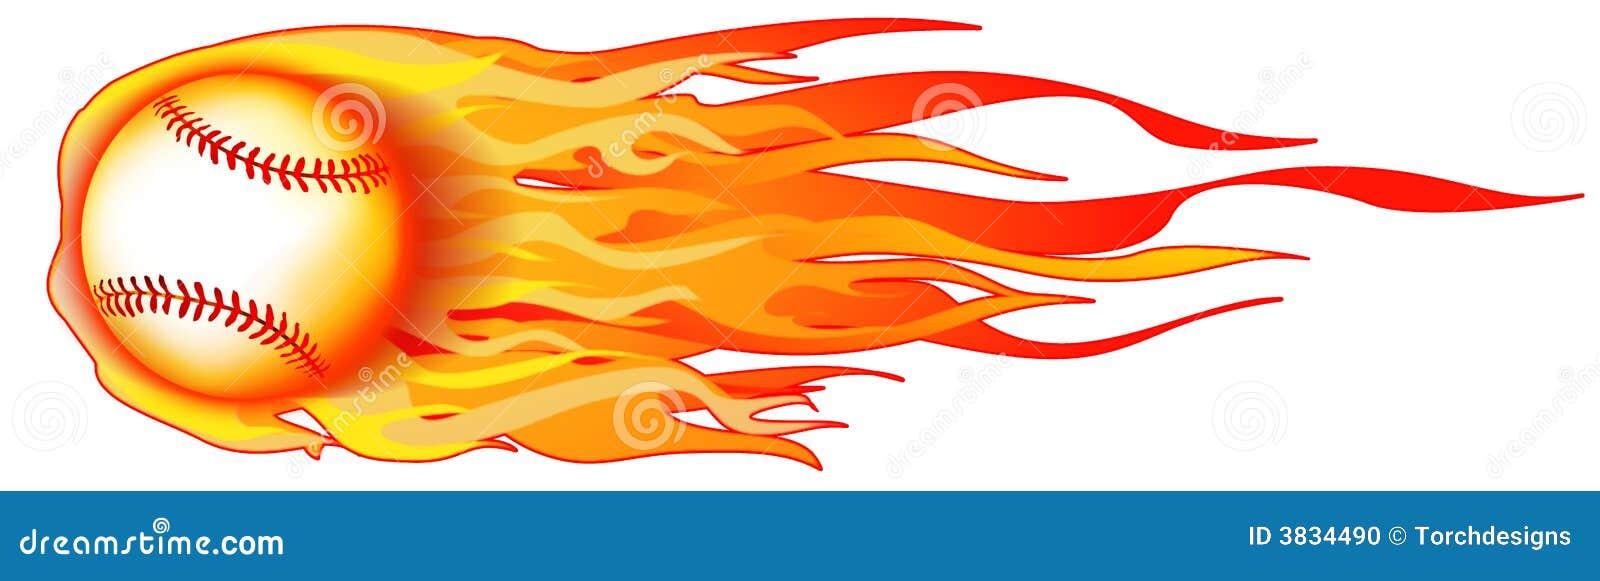 Płonąca ilustracja baseball